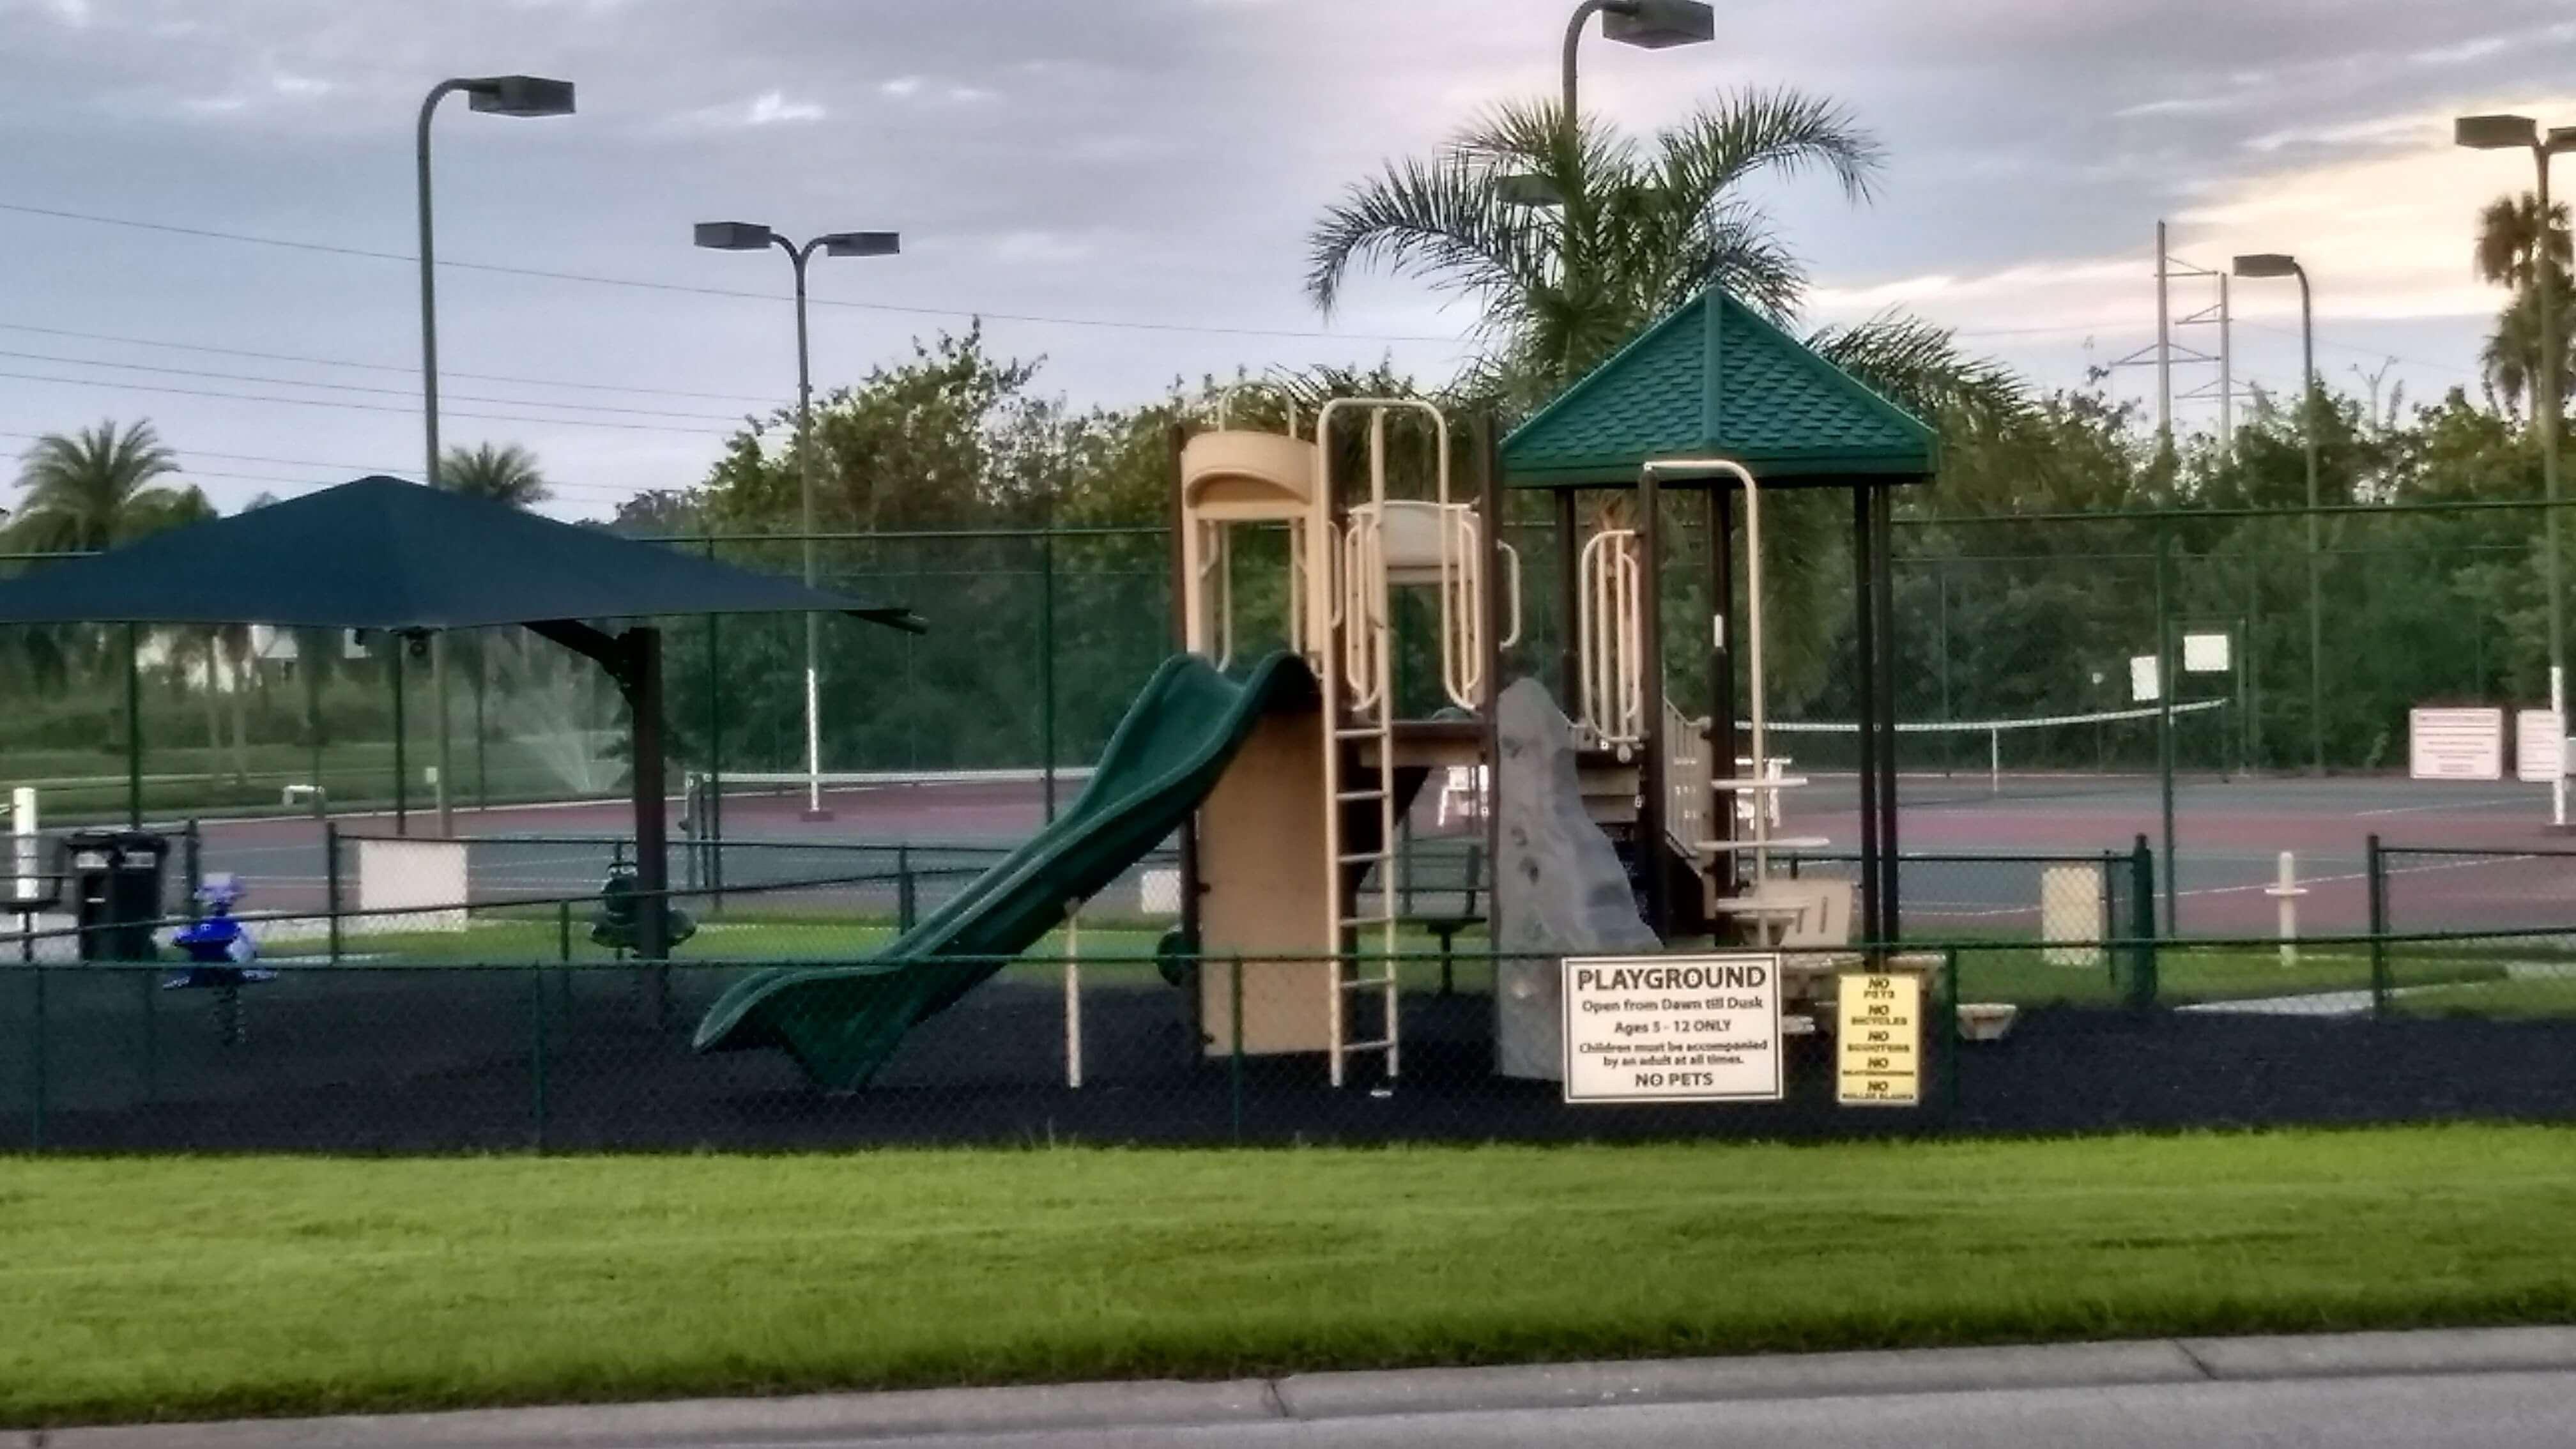 Children's Play Area